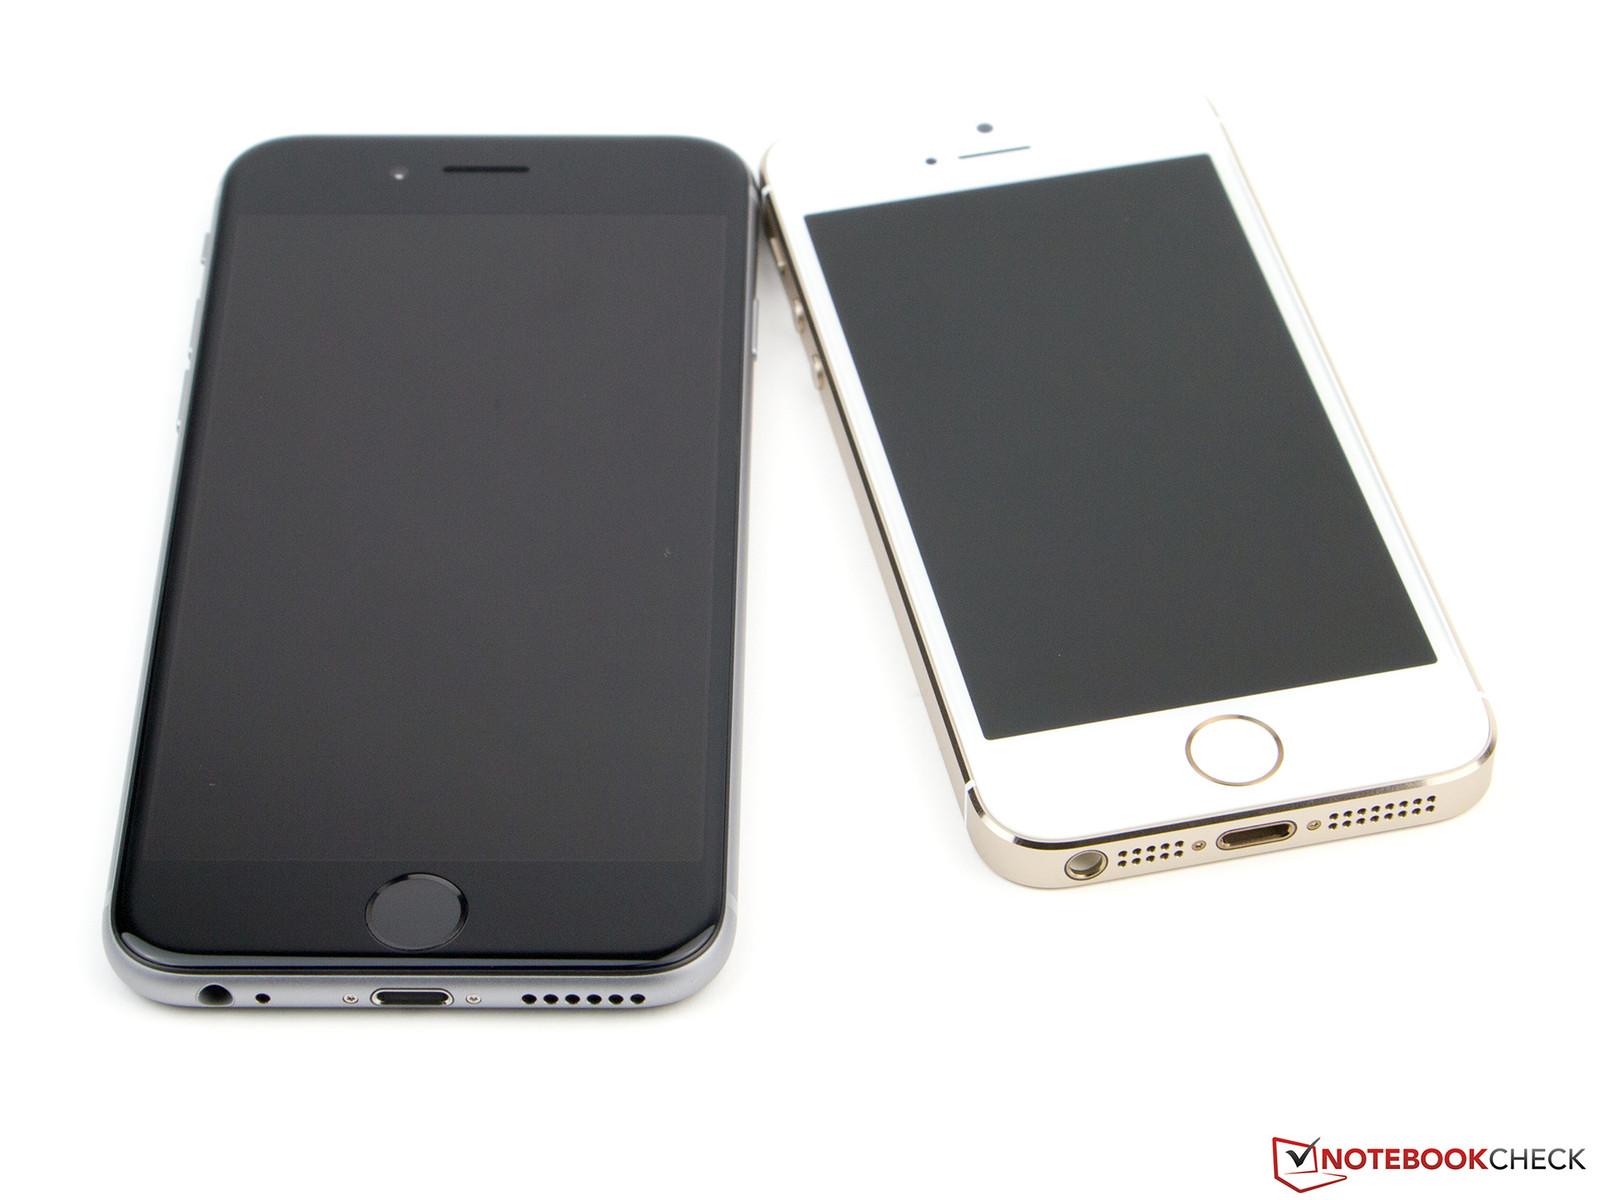 cfa37a1ef77 Análisis completo del Smartphone Apple iPhone 6 - Notebookcheck.org